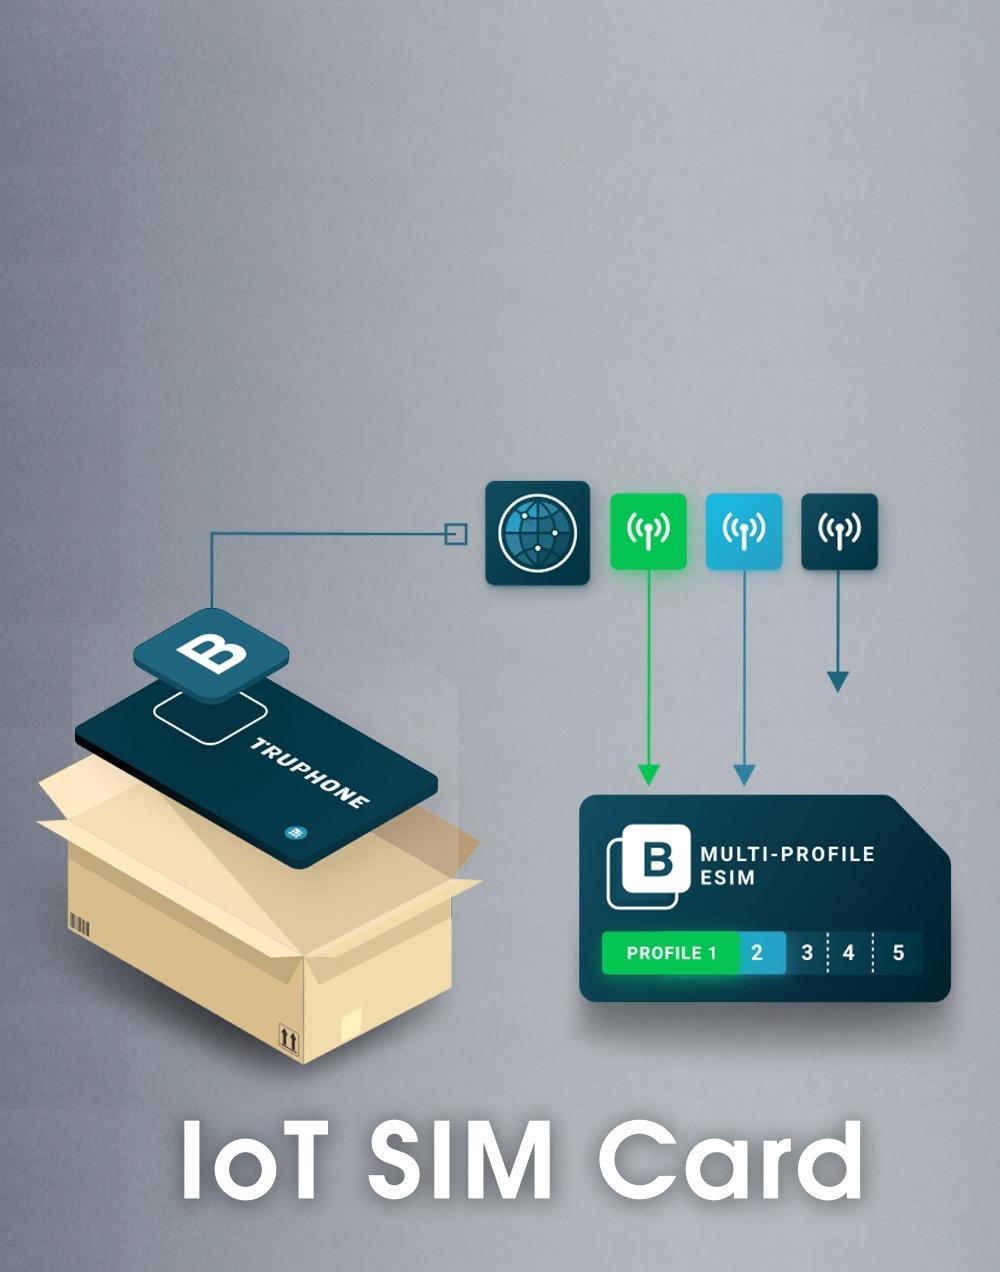 lot sim card